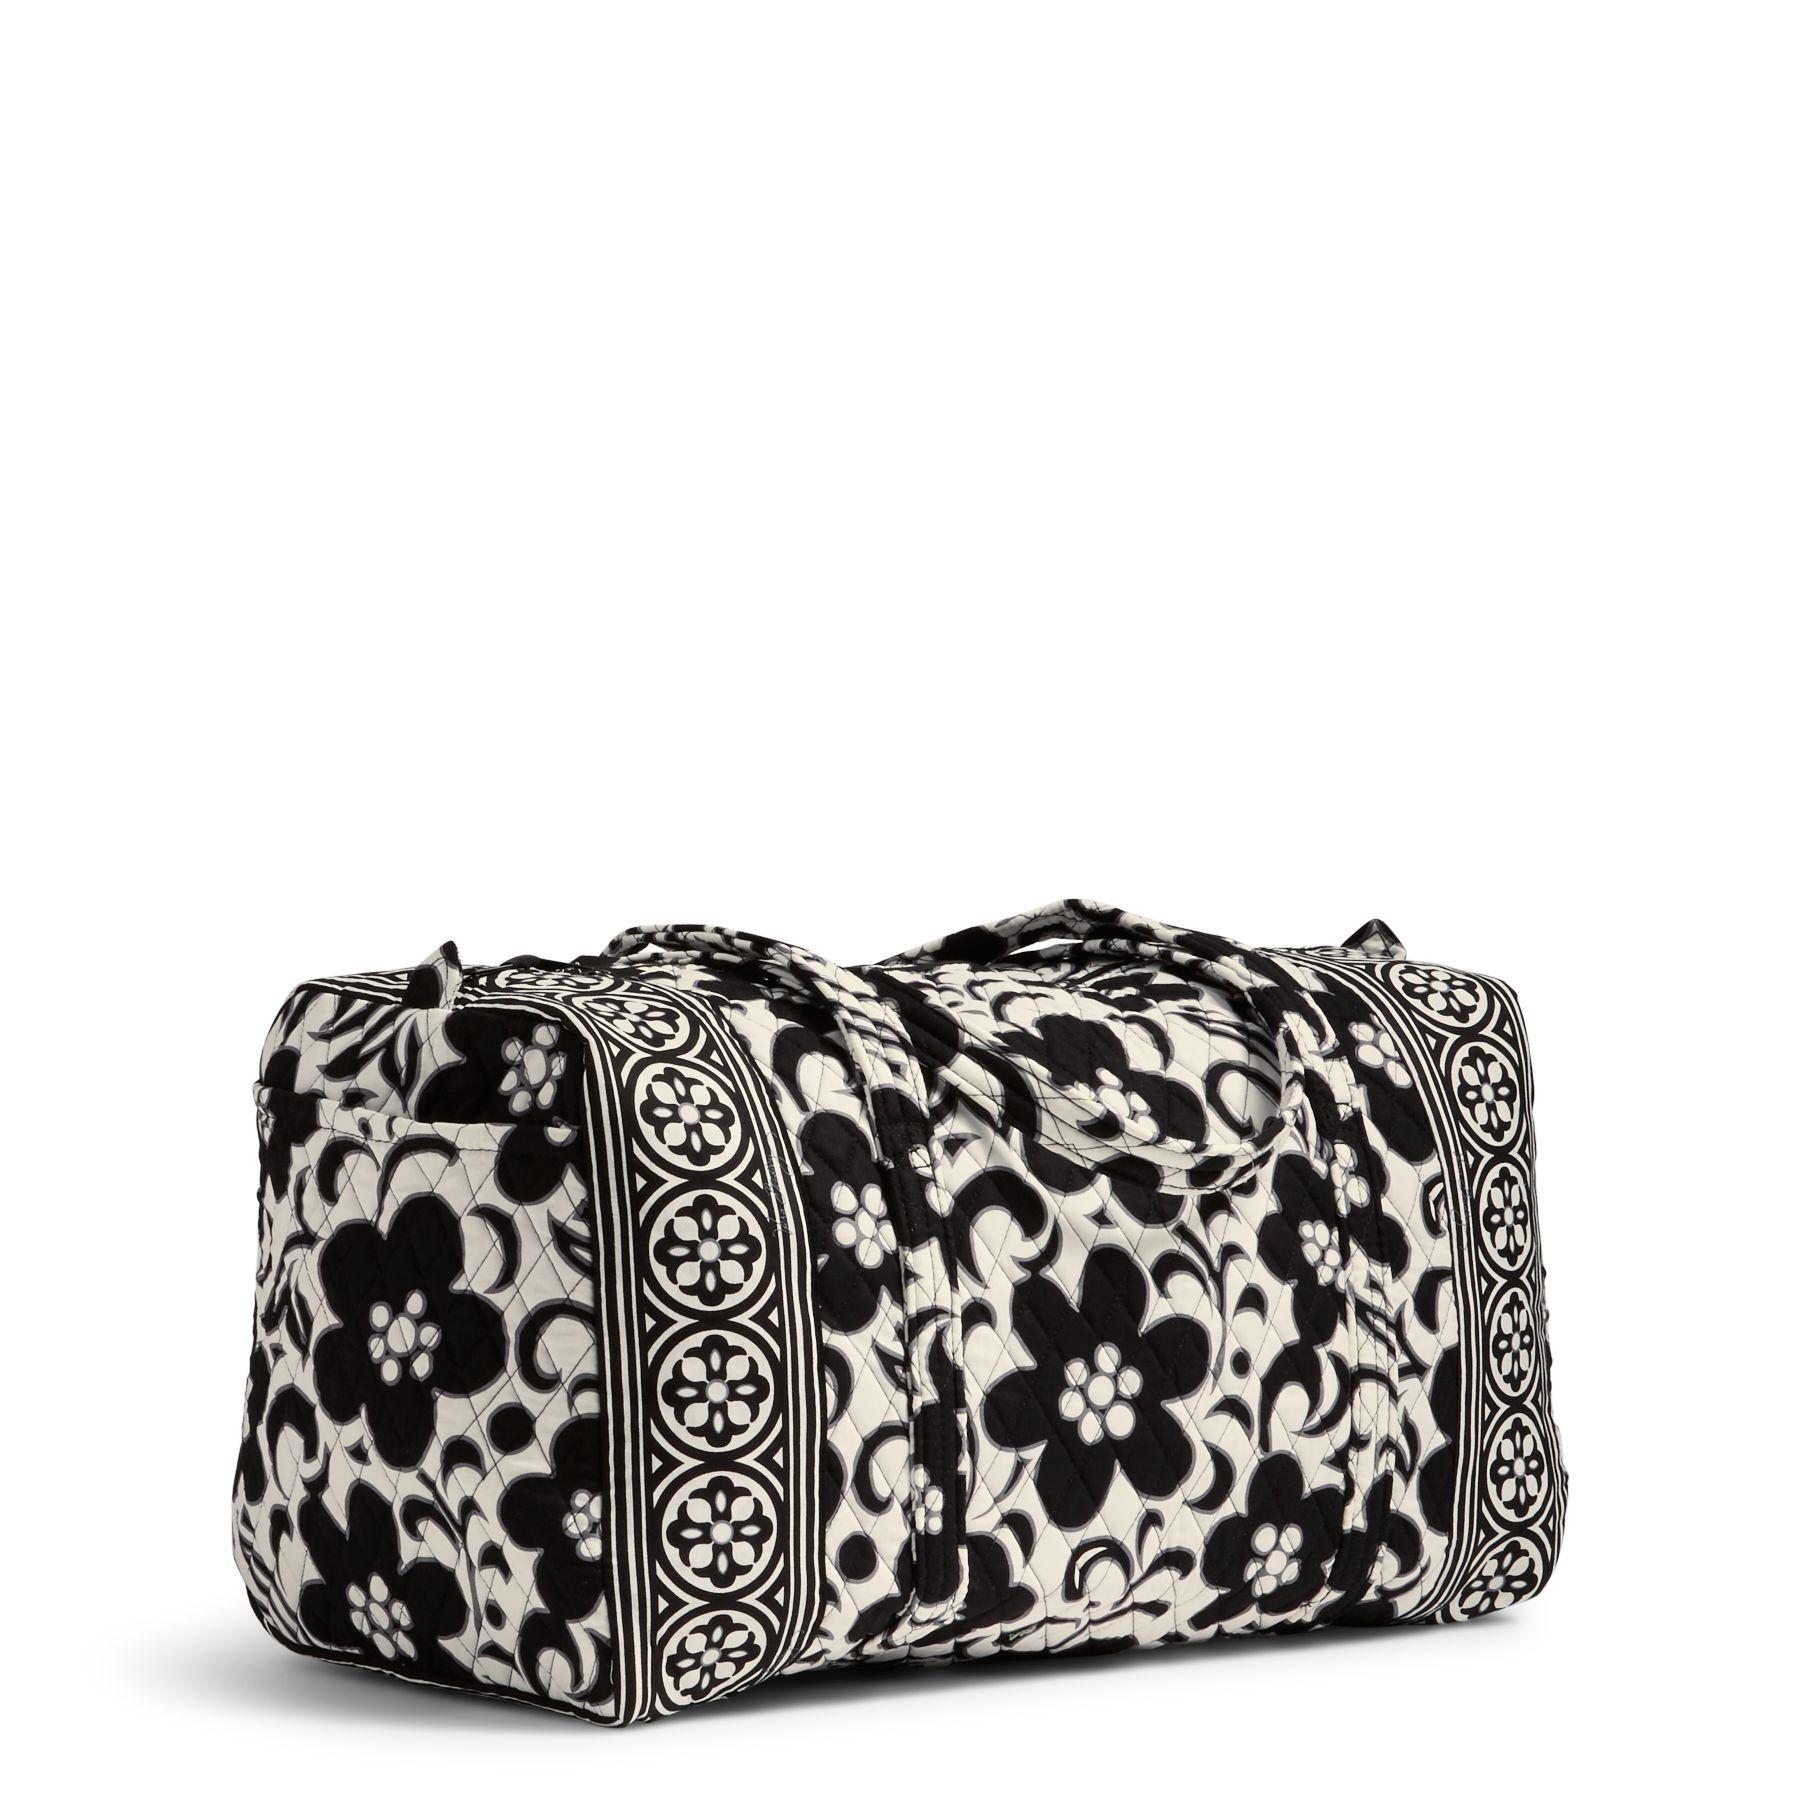 Gym Bag Vera Bradley: Vera Bradley Factory Exclusive Large Duffel Bag